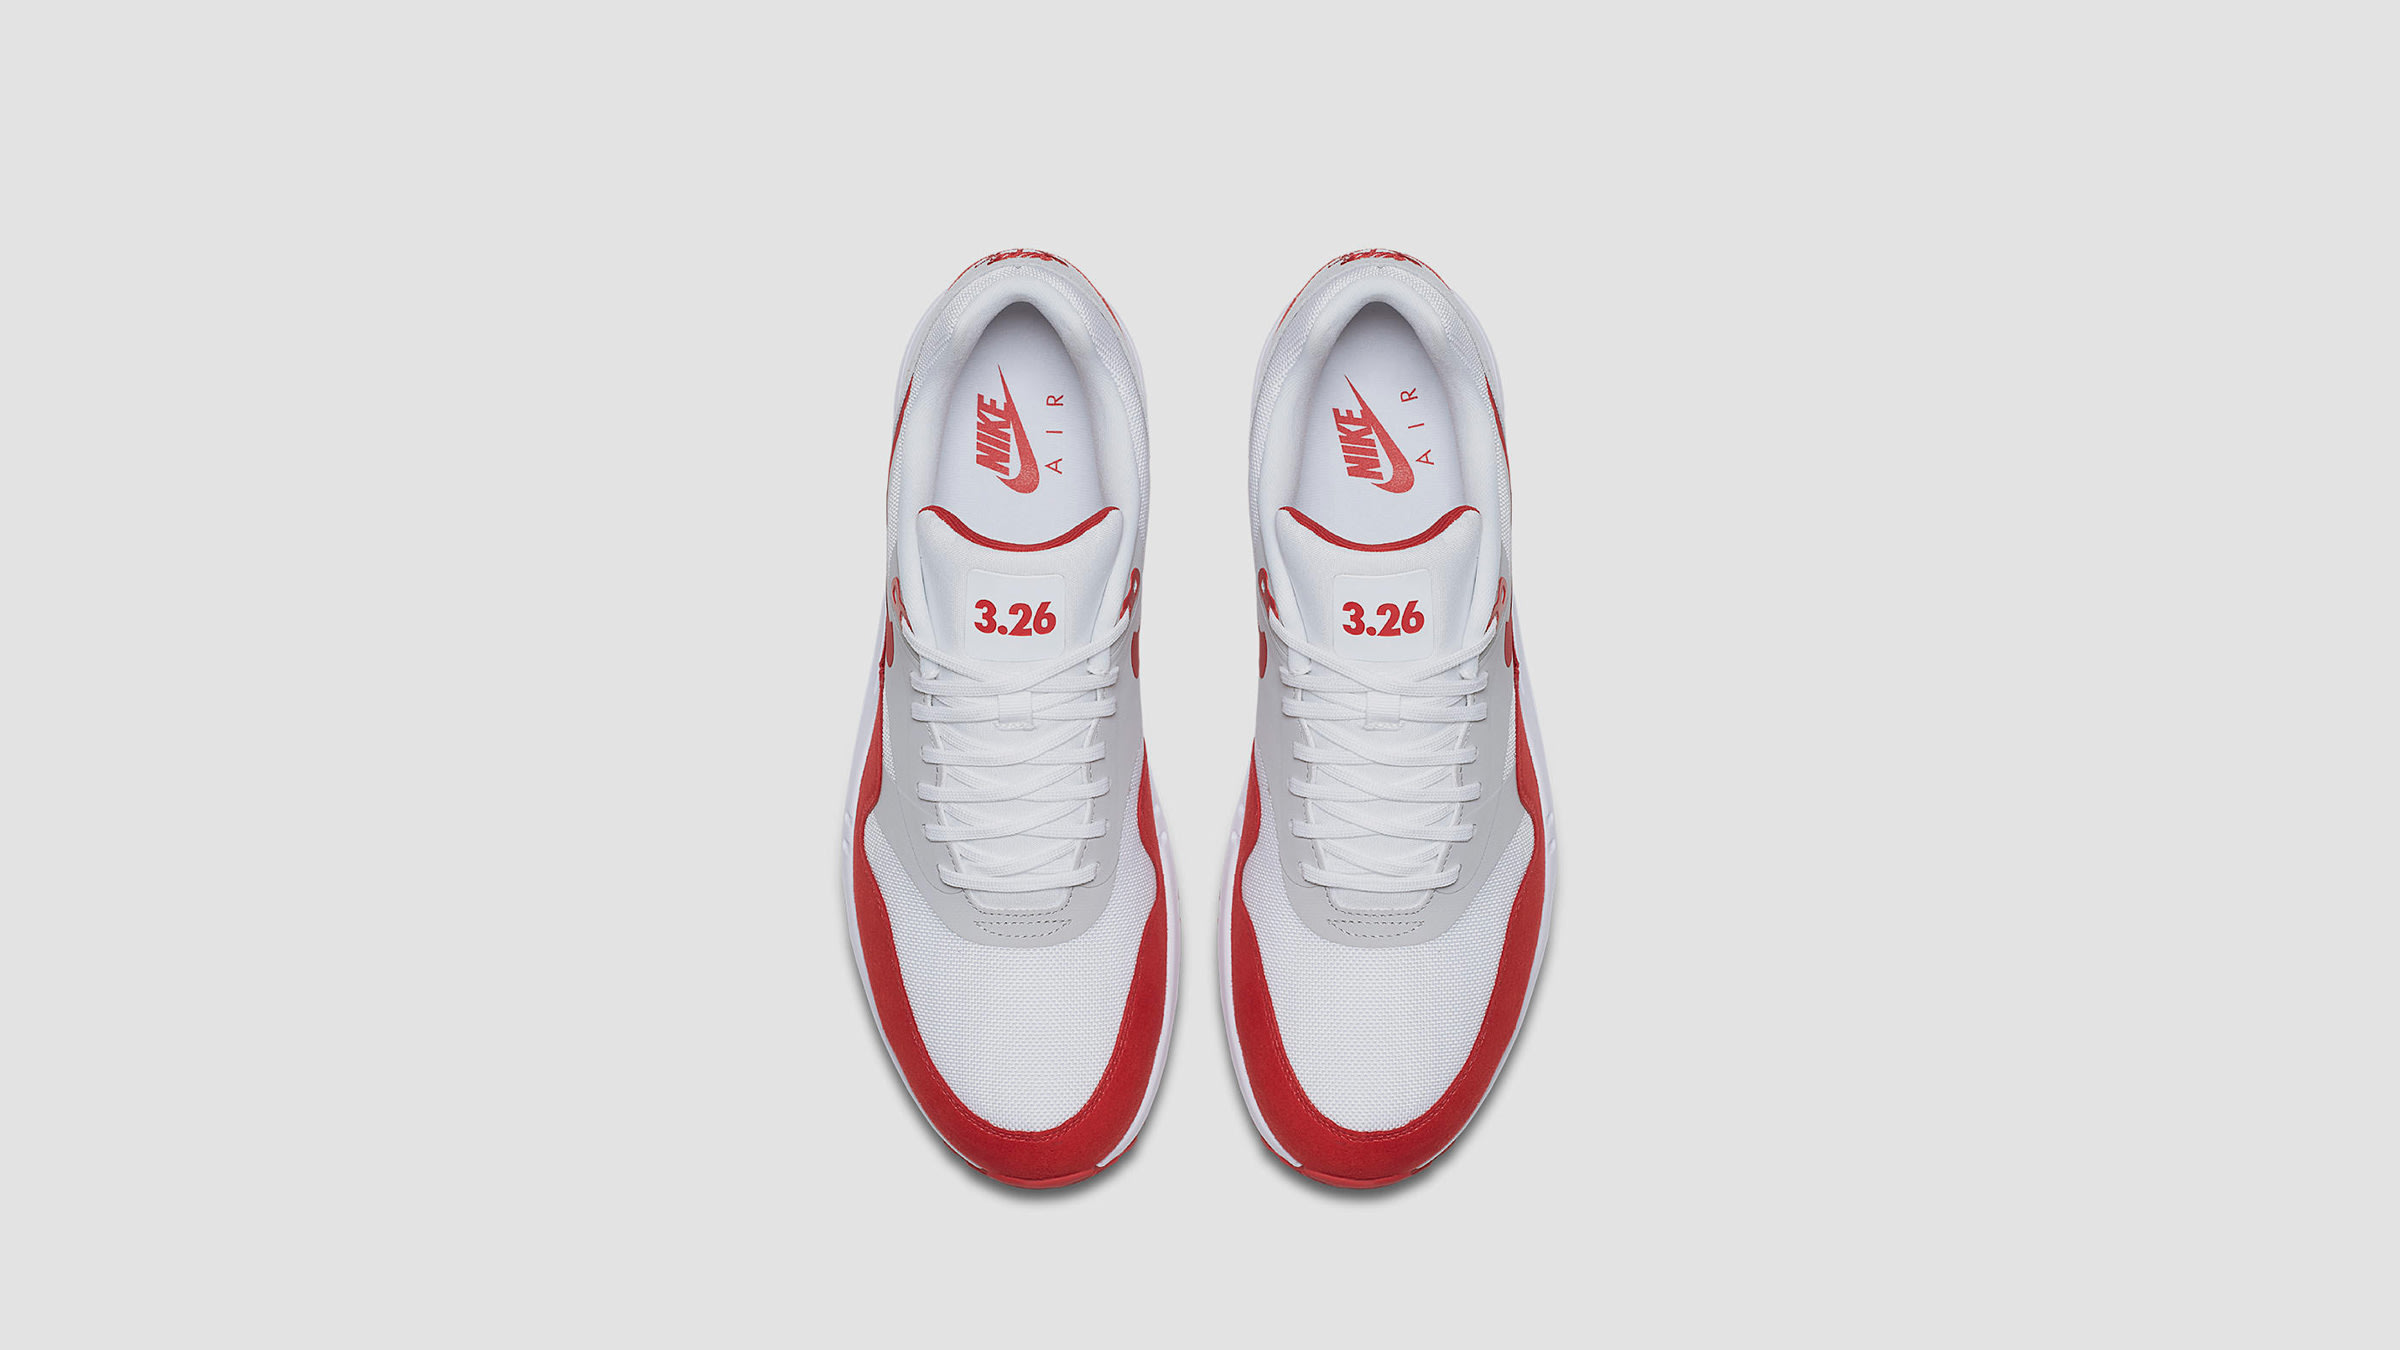 premium selection e324b bf766 Nike Air Max 1 Ultra 2.0 LE White   University Red   END.